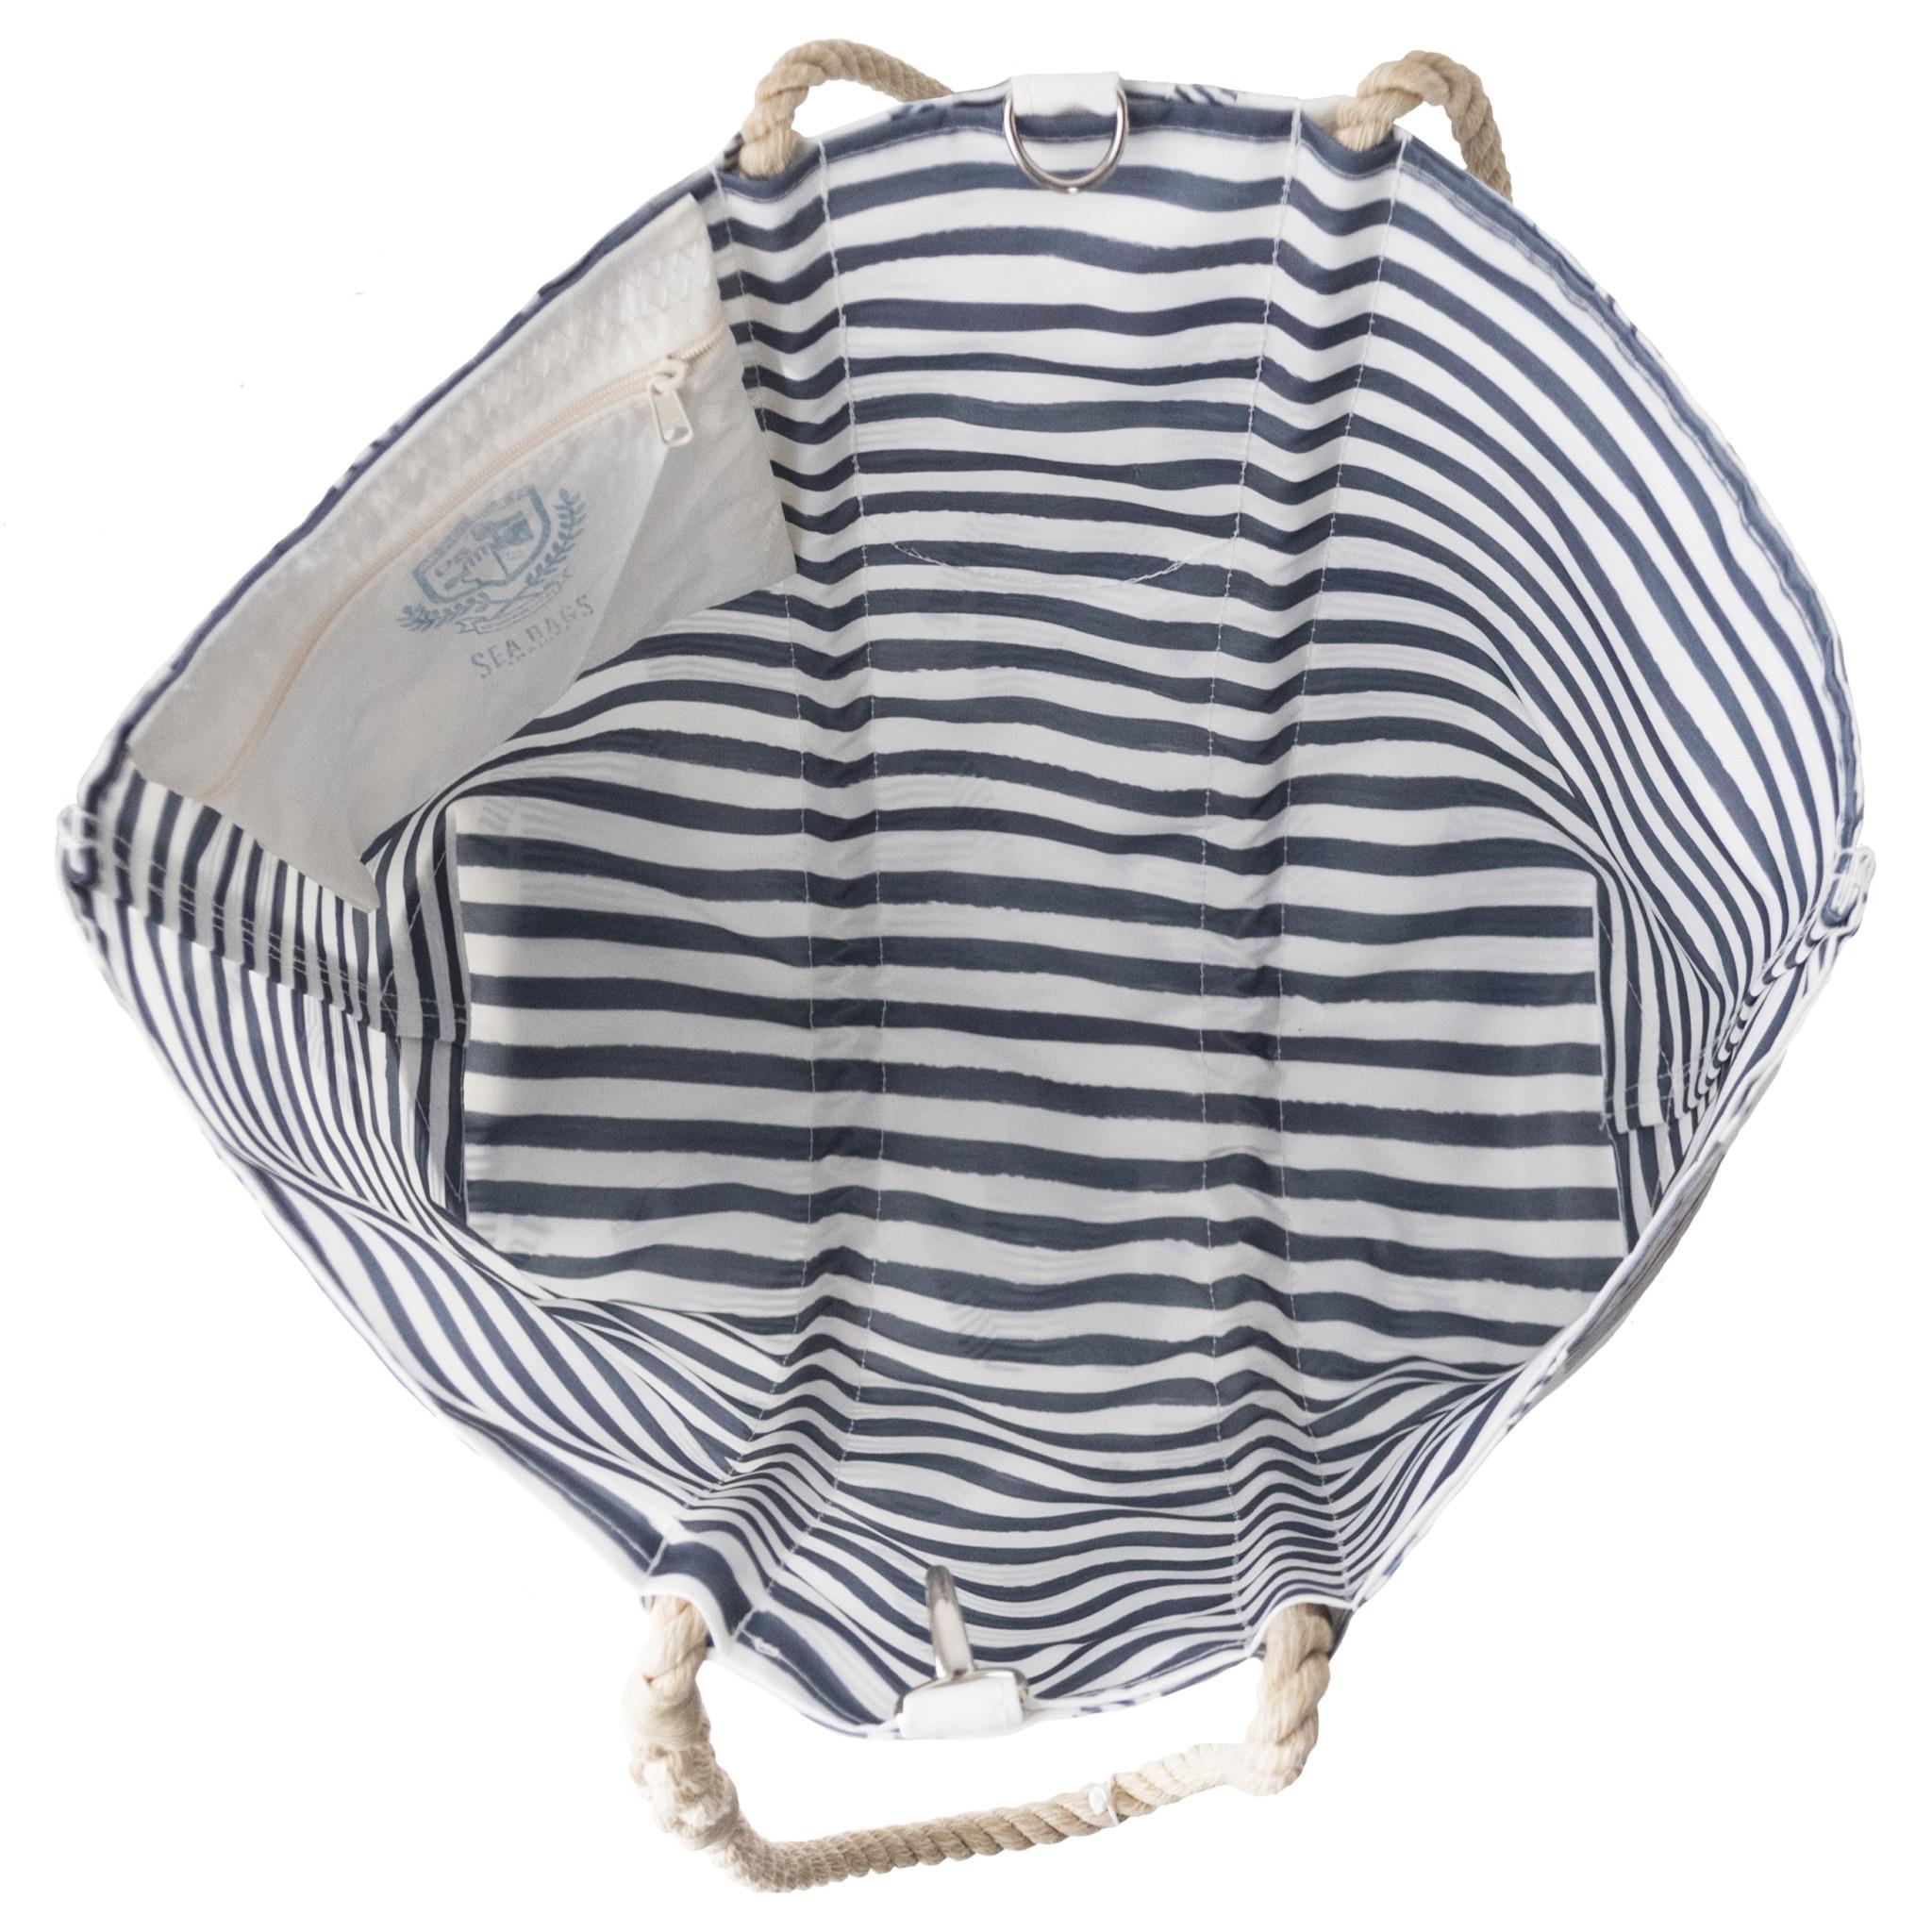 Sea Bags Sara Fitz Striped Shirt Pattern Tote - Hemp Handle - Medium with Clasp